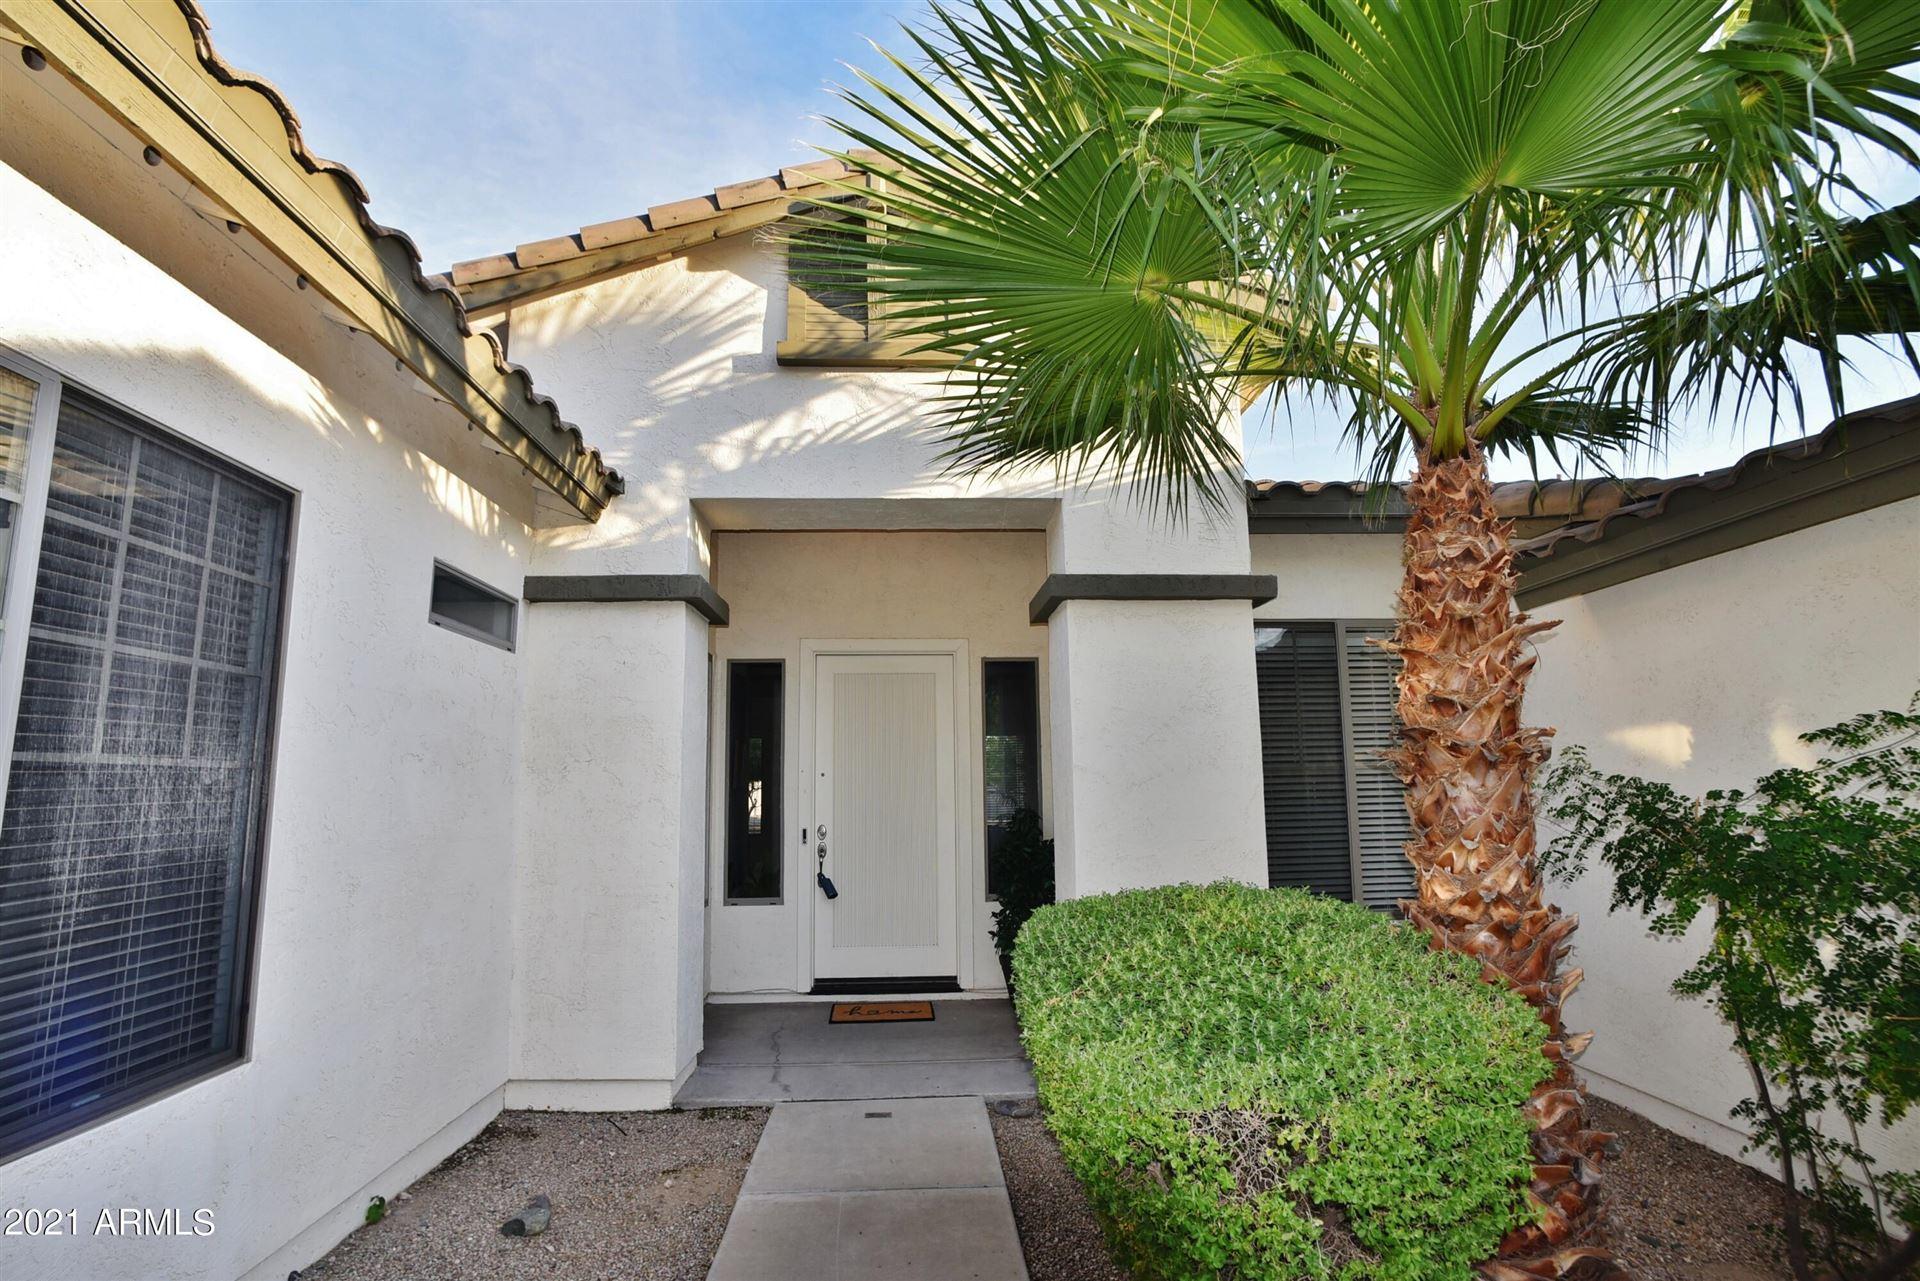 Photo of 13113 W SOLANO Drive, Litchfield Park, AZ 85340 (MLS # 6304394)